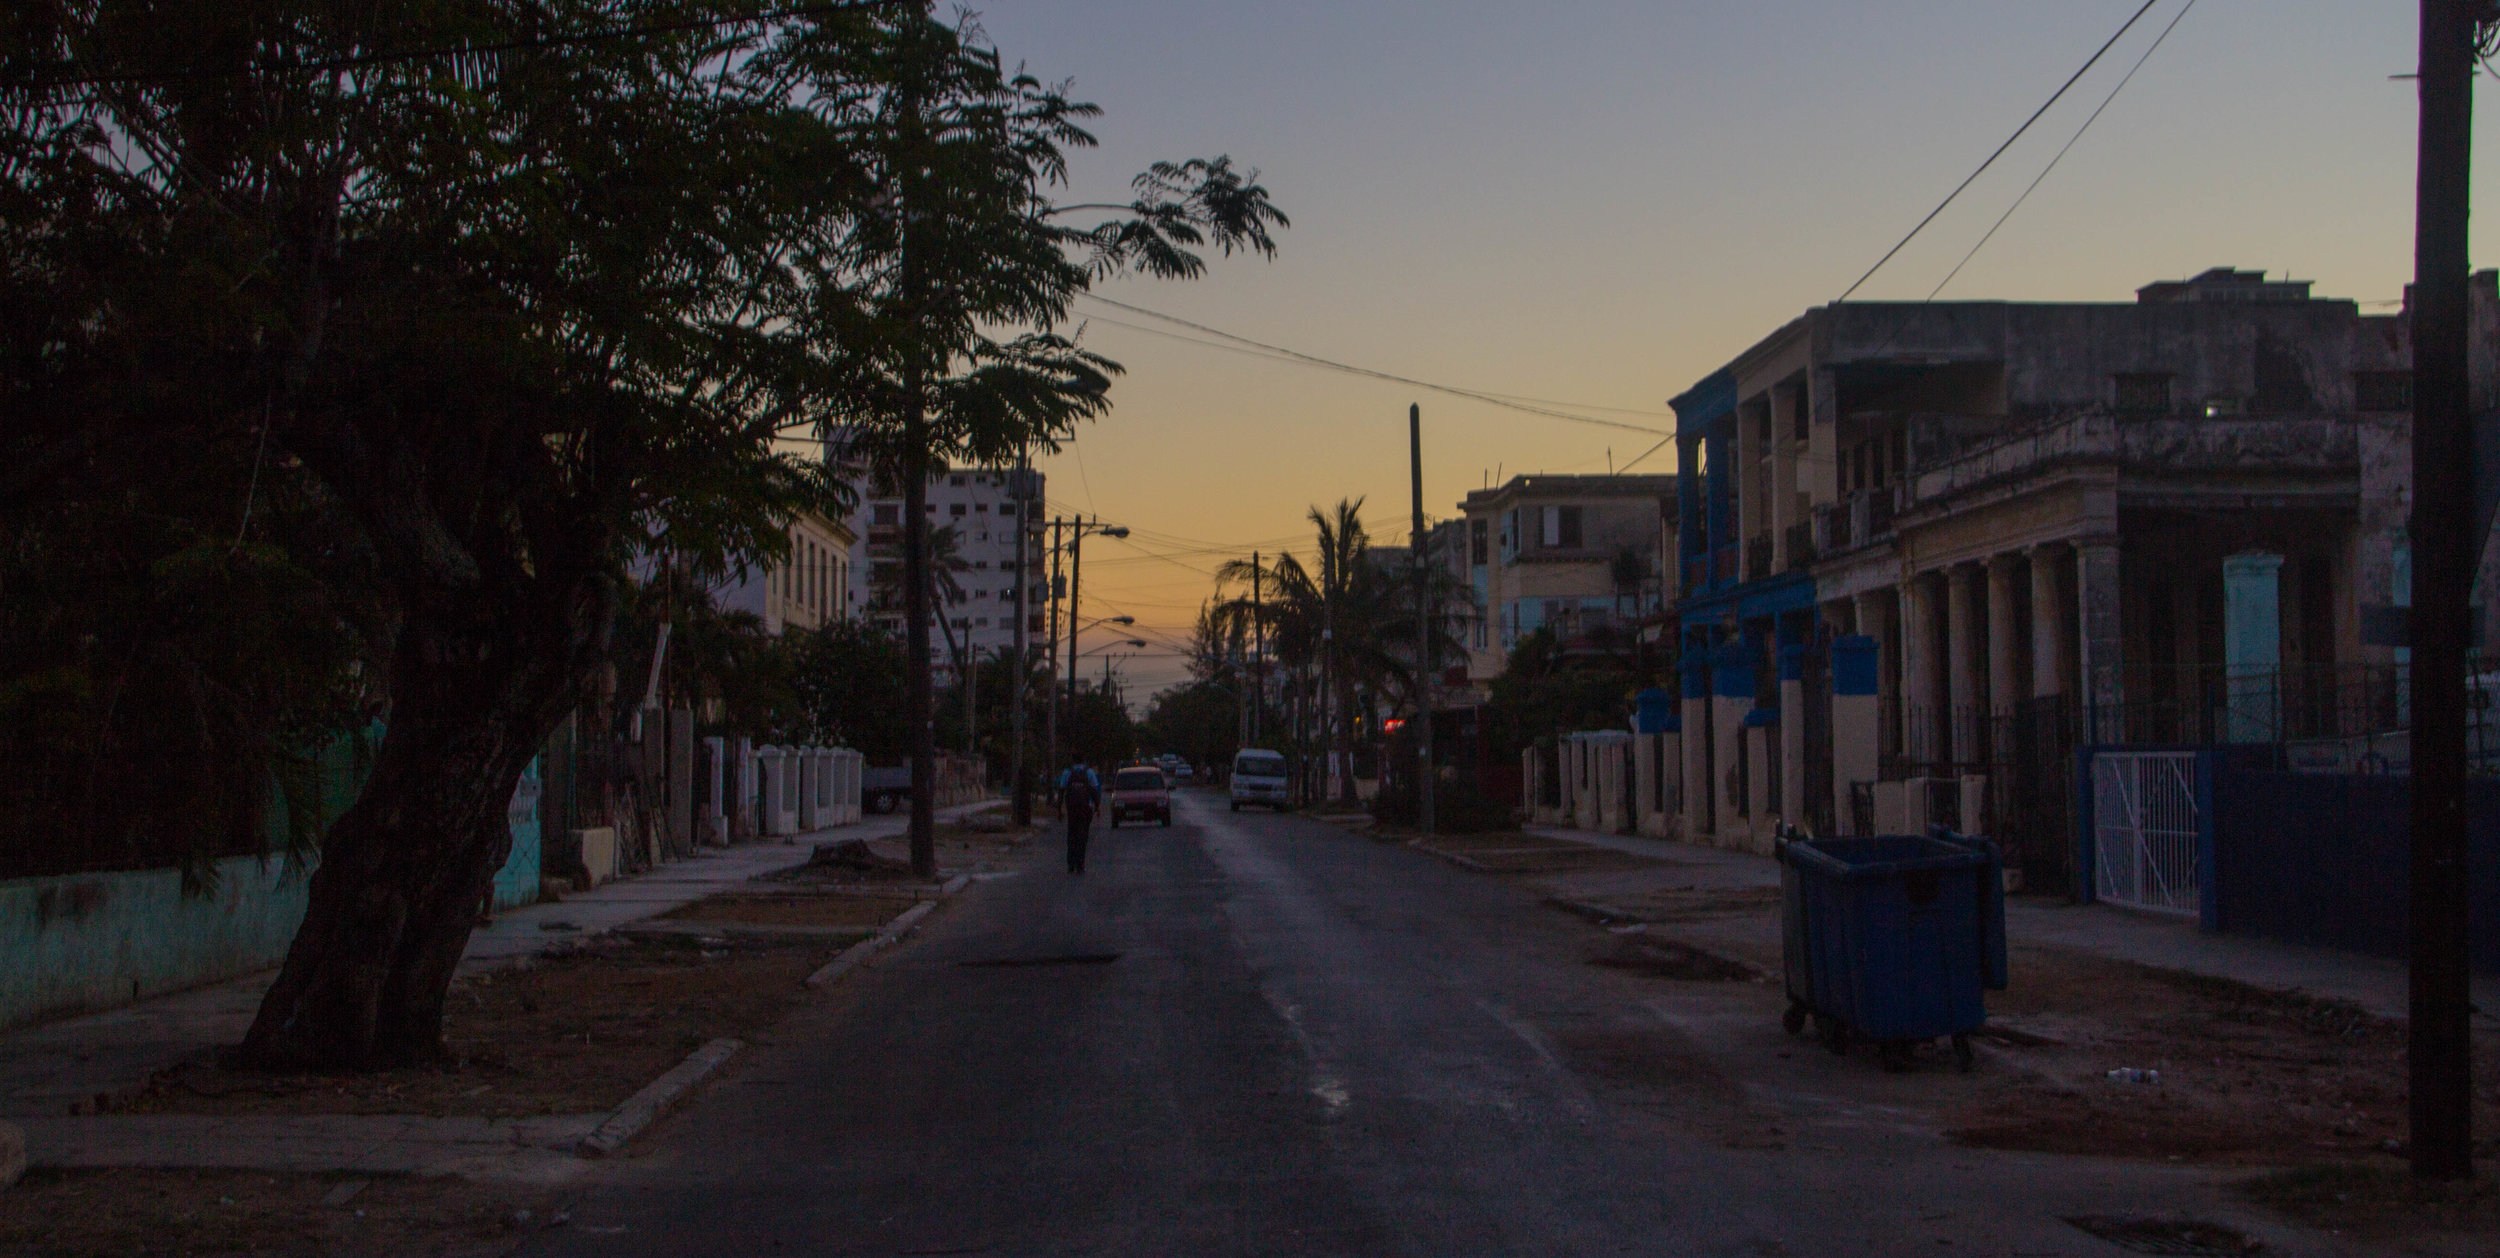 streets sunset vedado havana cuba-1-2.jpg